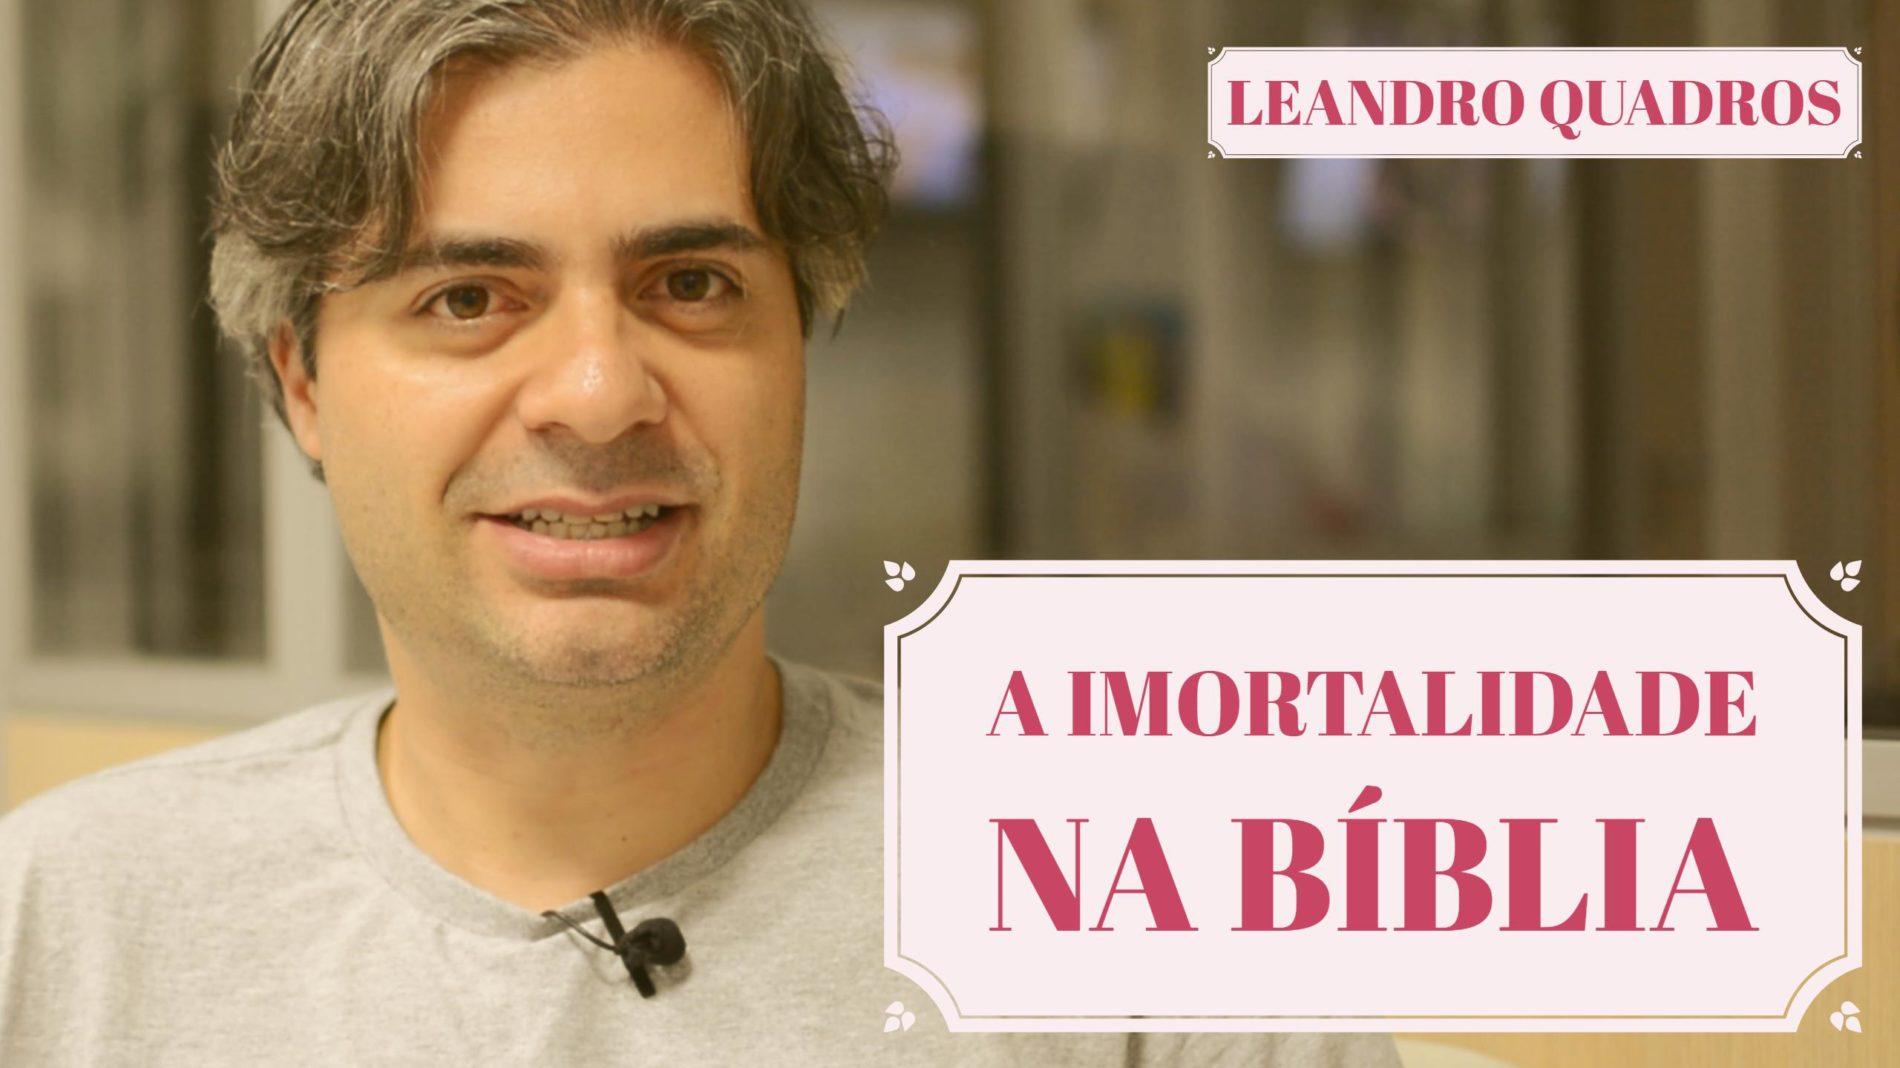 A imortalidade na Bíblia